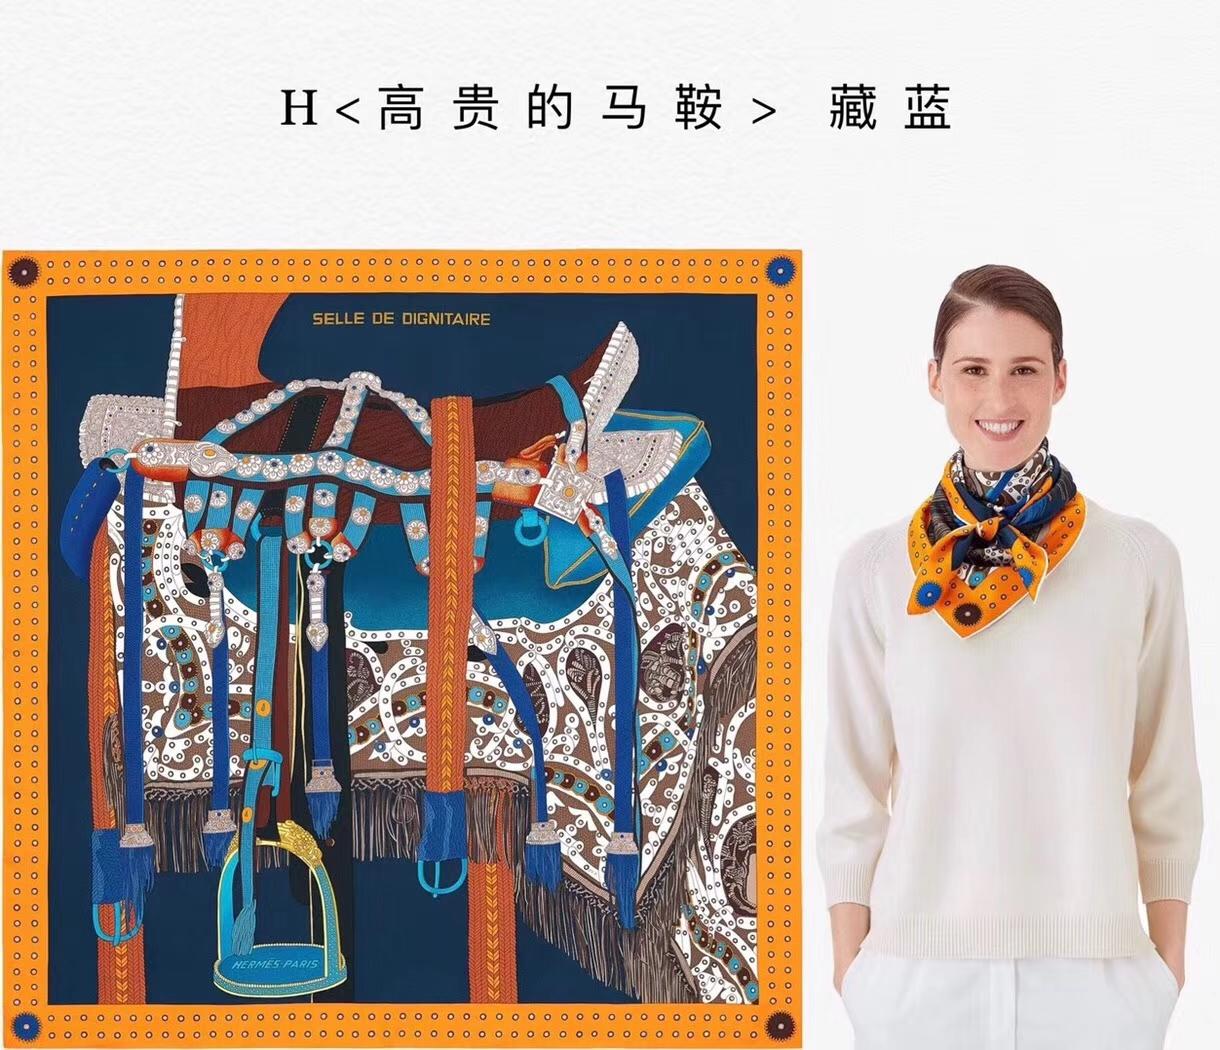 Discount Hermes 2018 Autumn New Silk Scarf《Elegant Saddle》90*90cm in Dark Blue